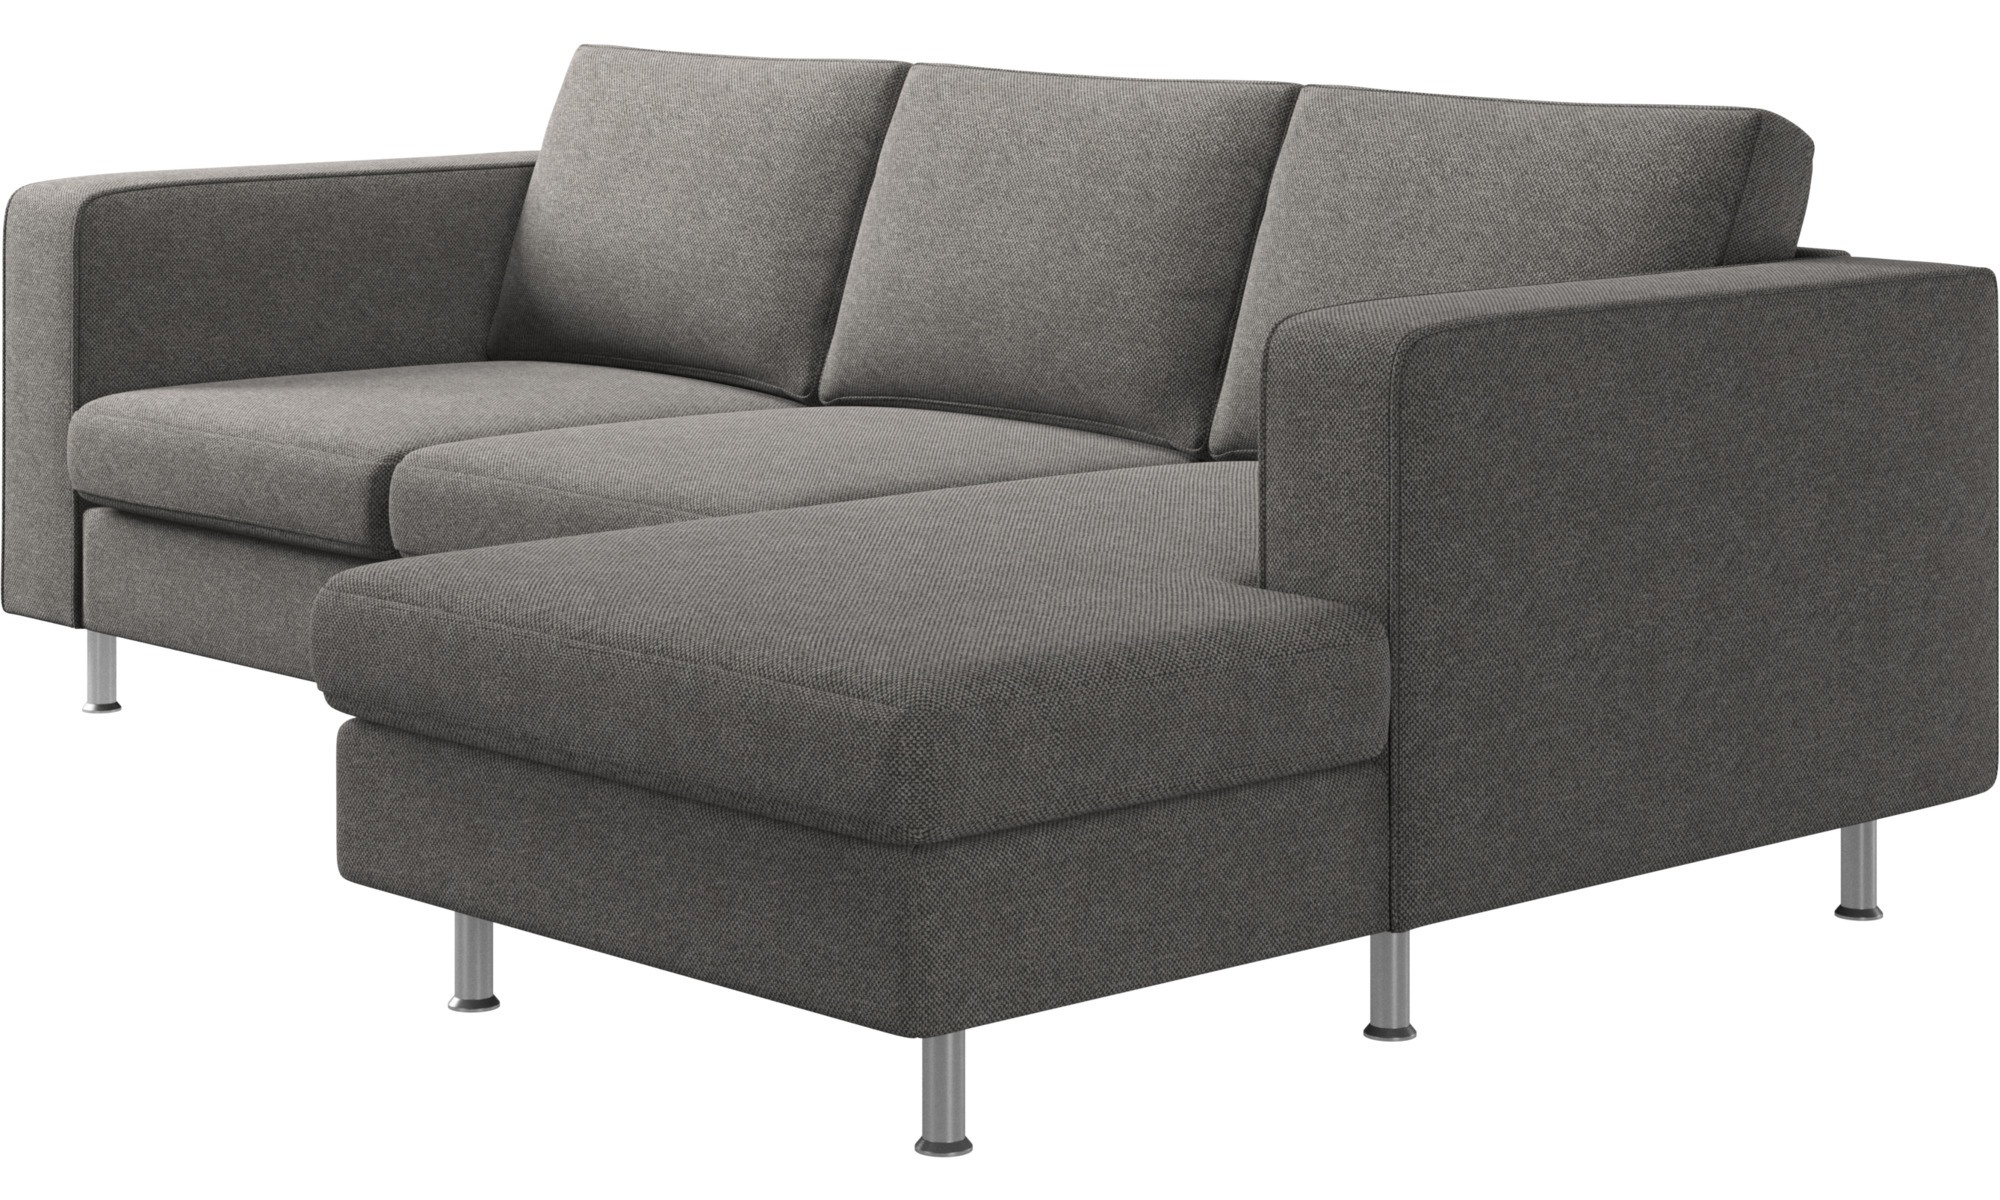 Ikea Credenza Bianca Hedmens : Kjkkenvask ikea. excellent finest full size of ideenschnes